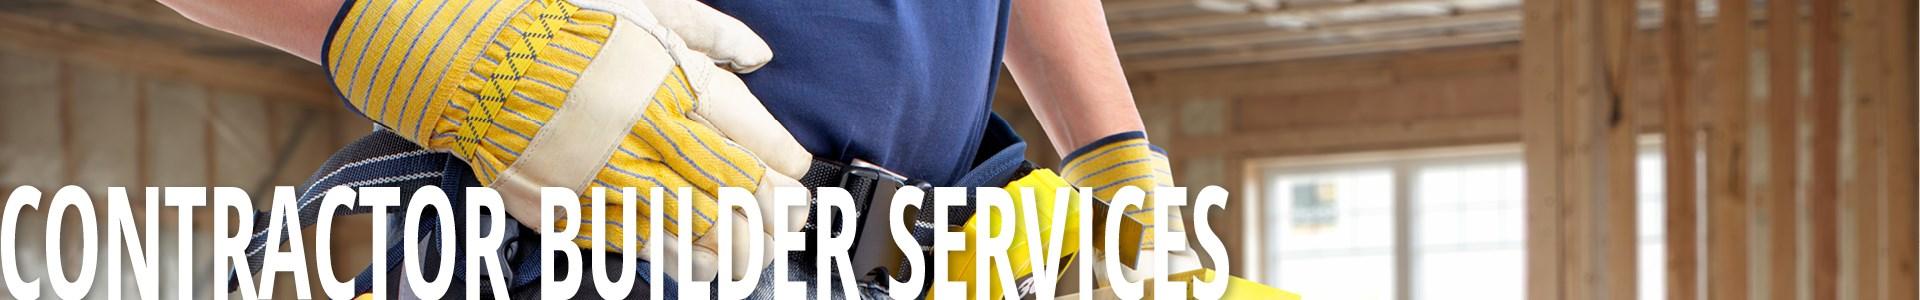 Boulevard Contractor Builder Services